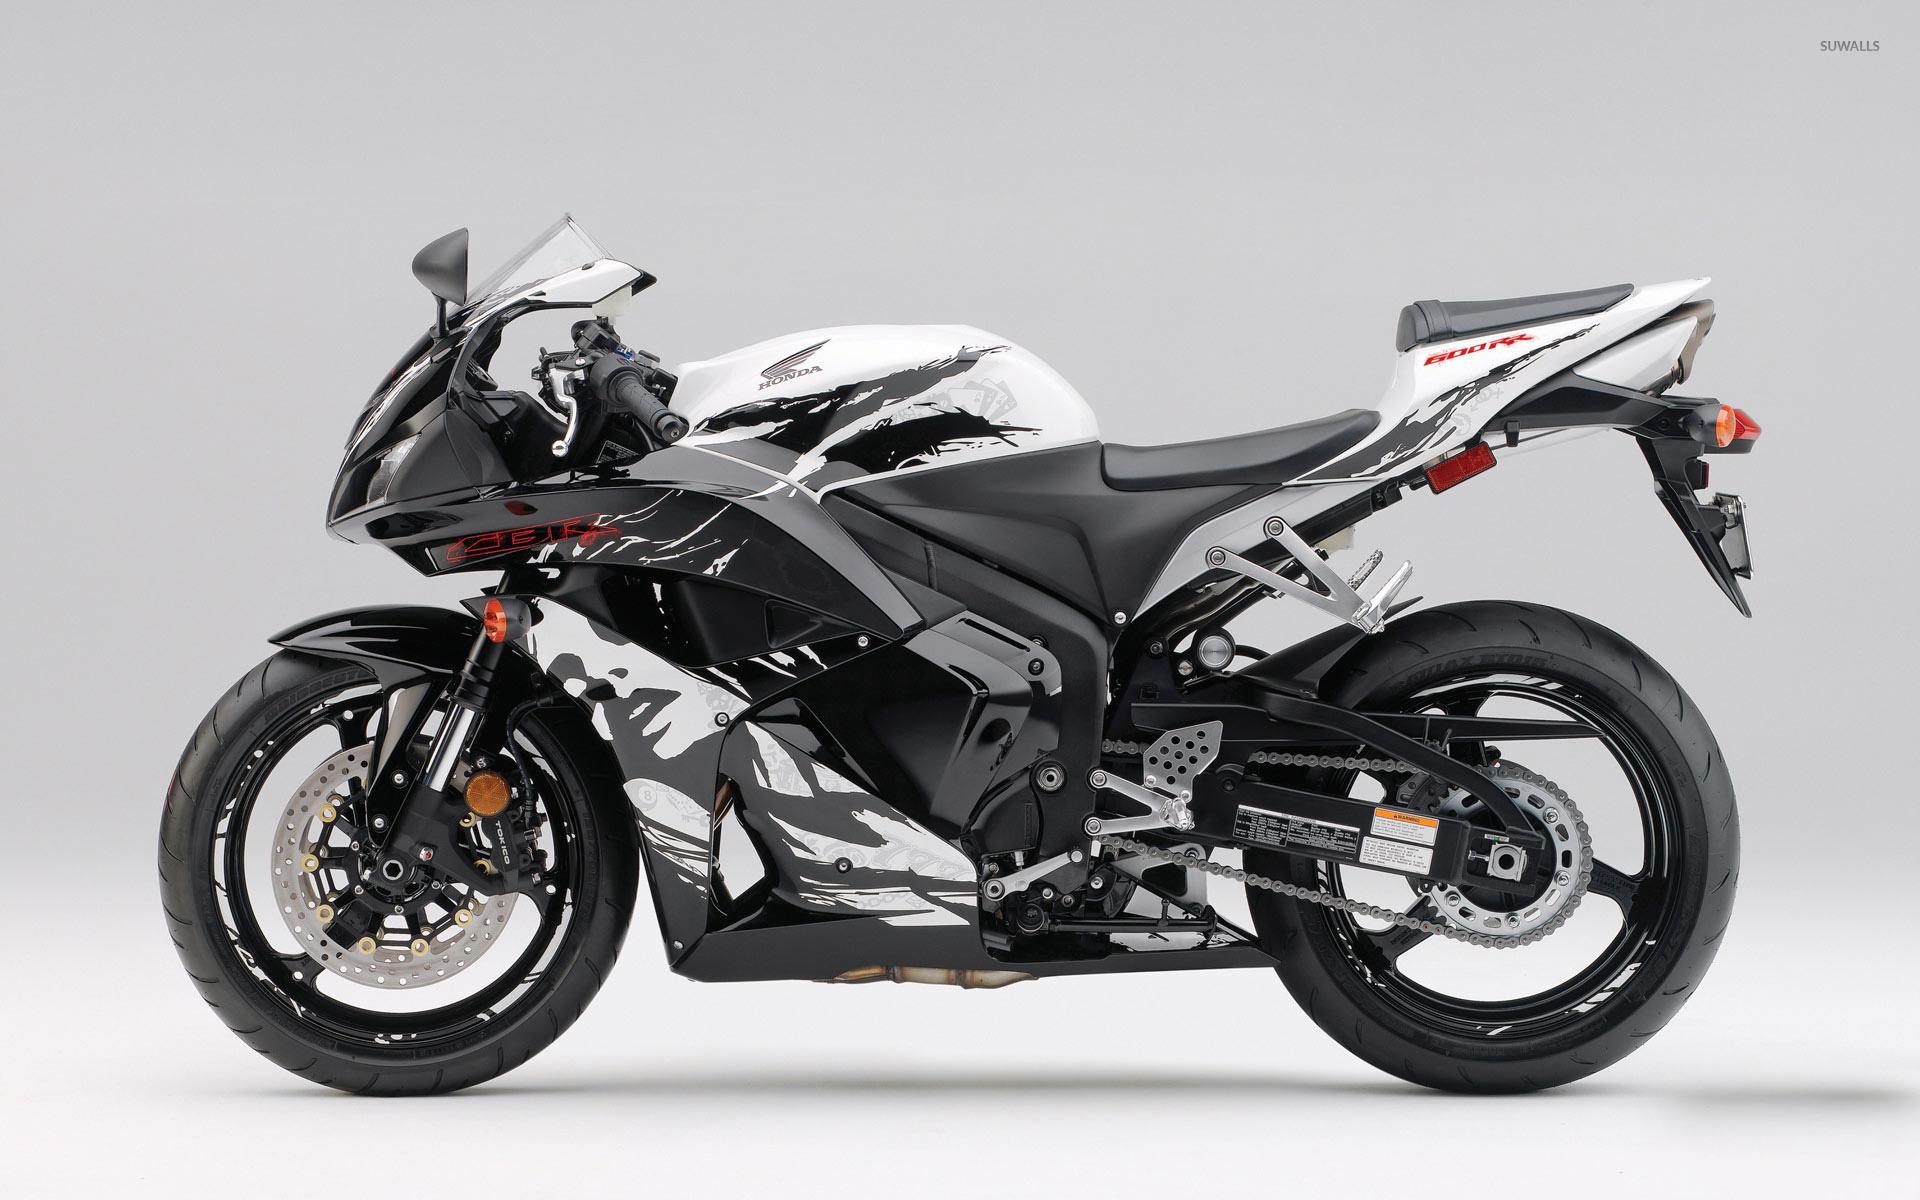 Honda CBR 600RR [4] wallpaper   Motorcycle wallpapers   10077 1920x1200